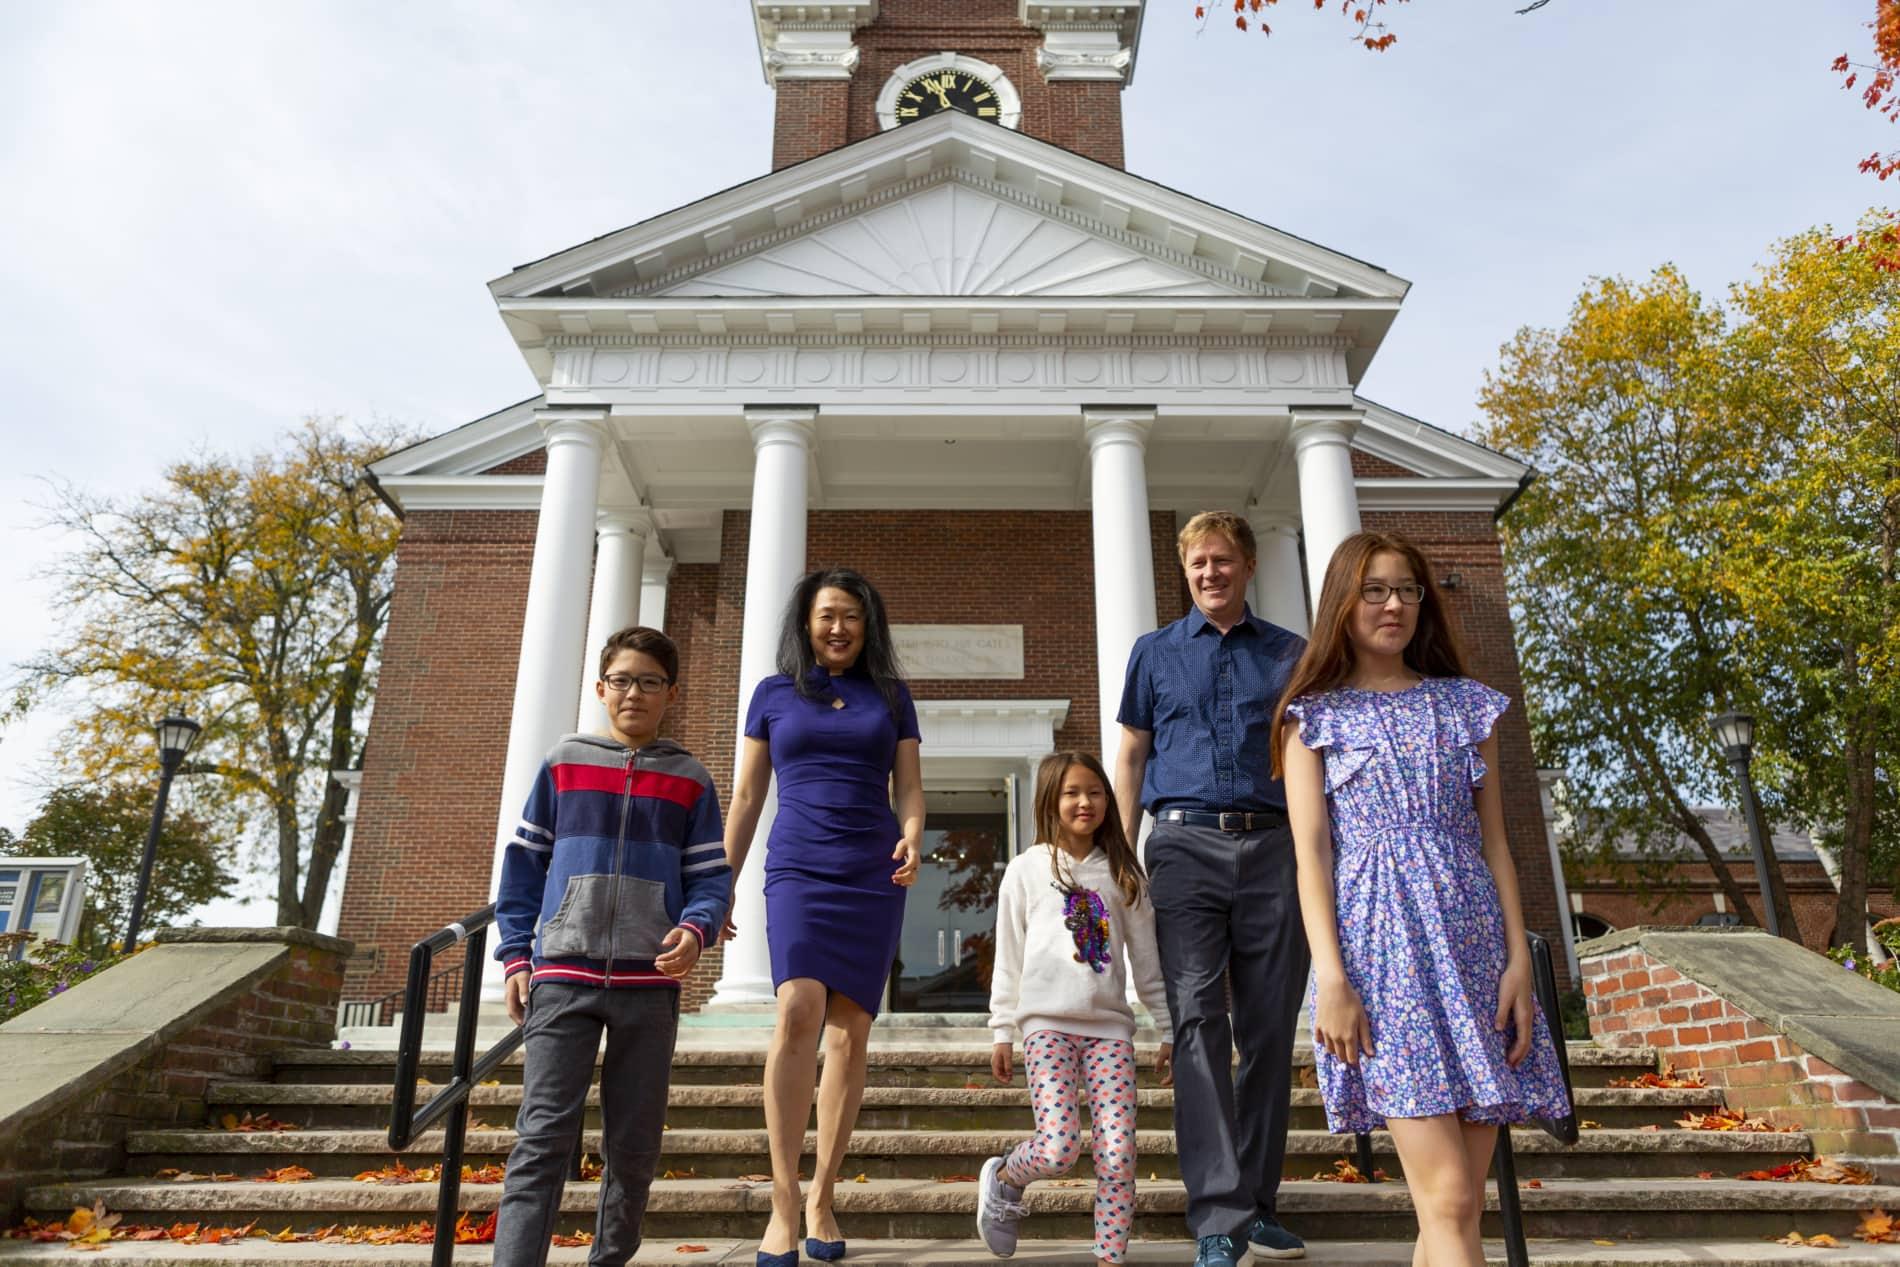 Family on church steps